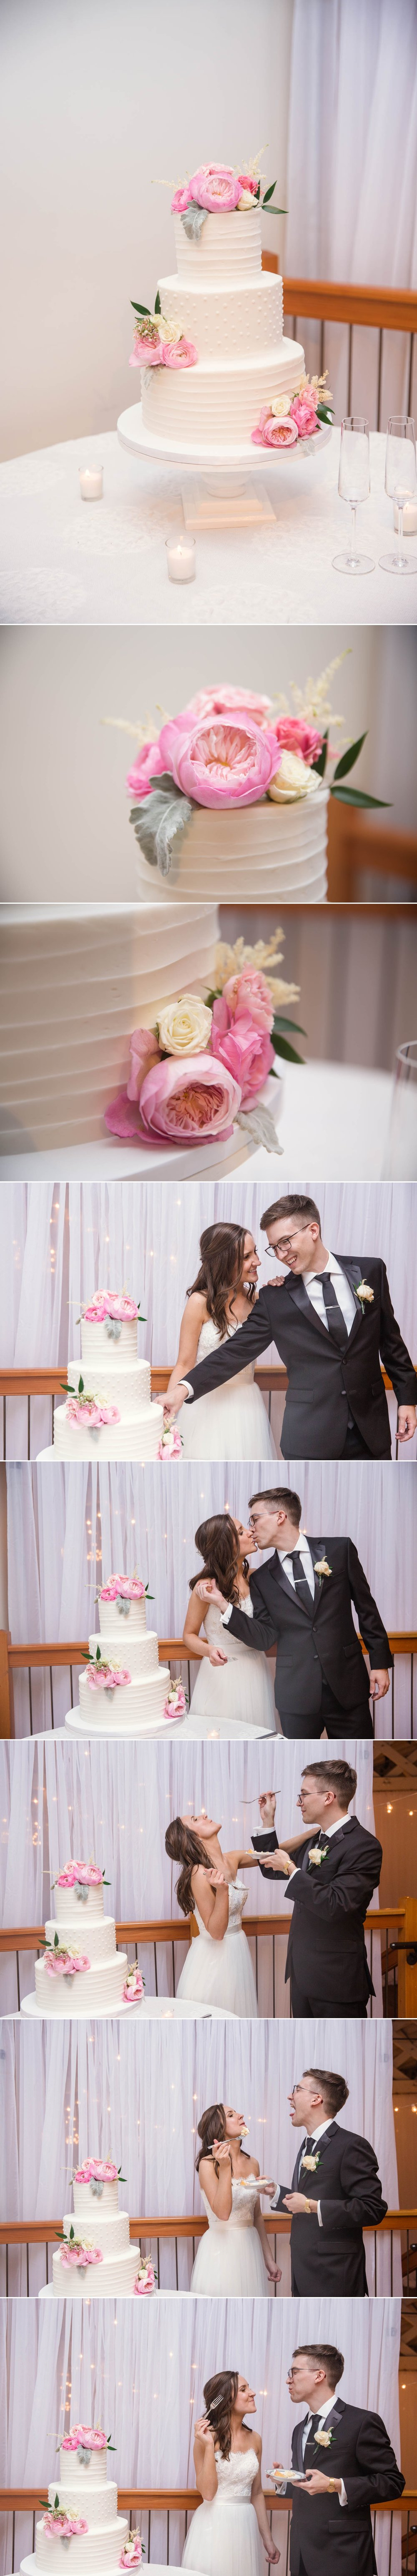 Elizabeth + Kane - Wedding at the Stockroom at 230 - Raleigh North Carolina Wedding Photographer 6.jpg